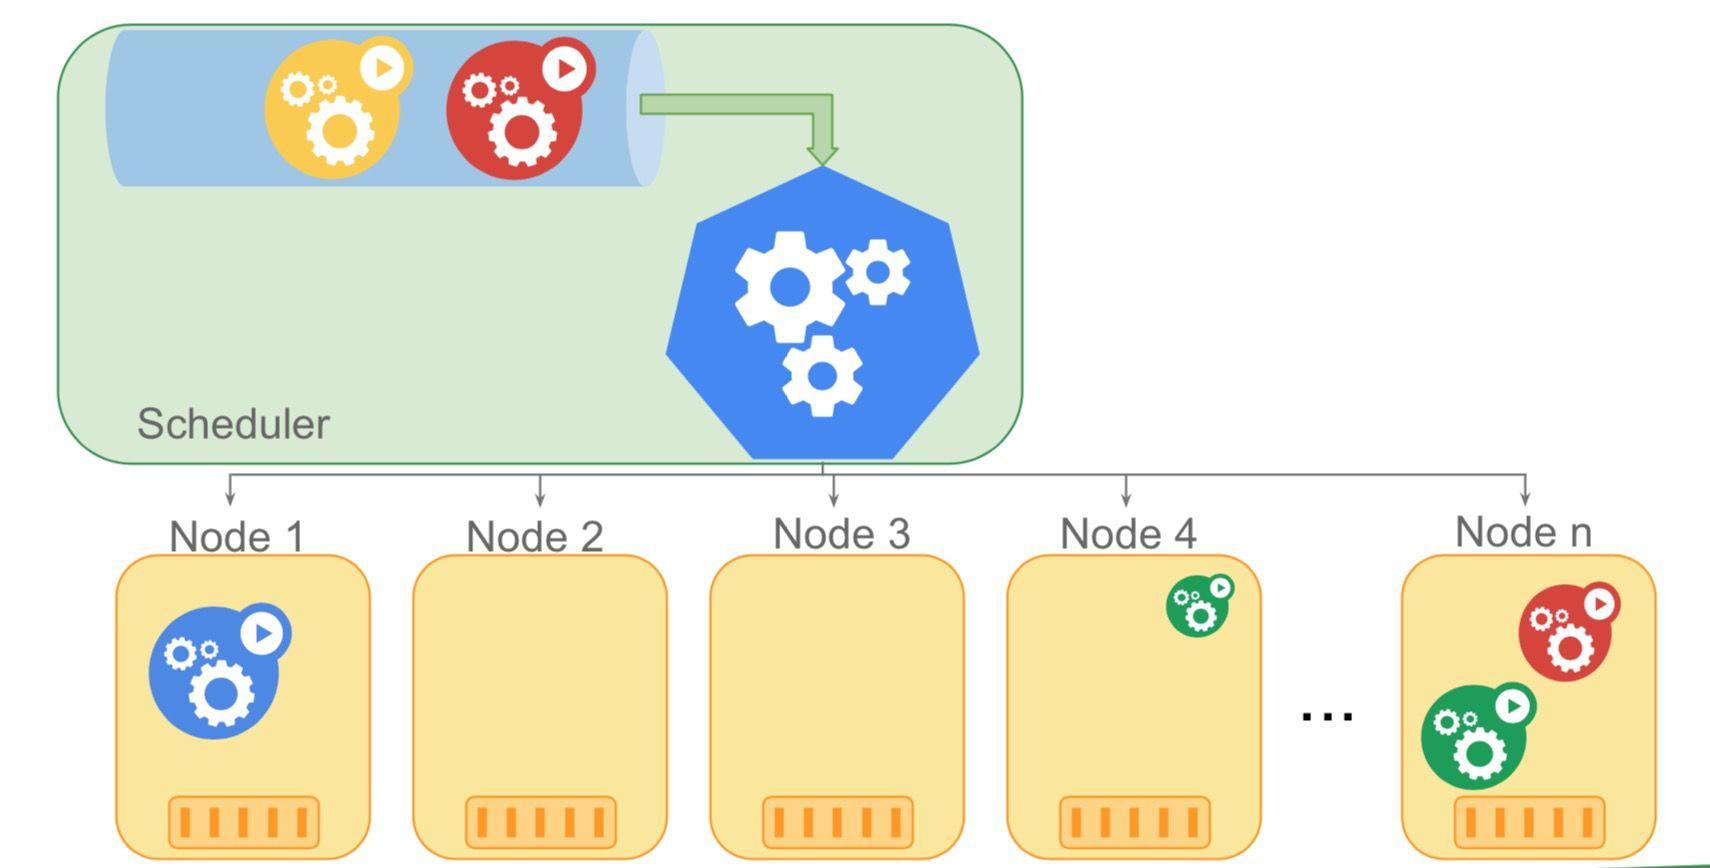 kube-scheduler示意图